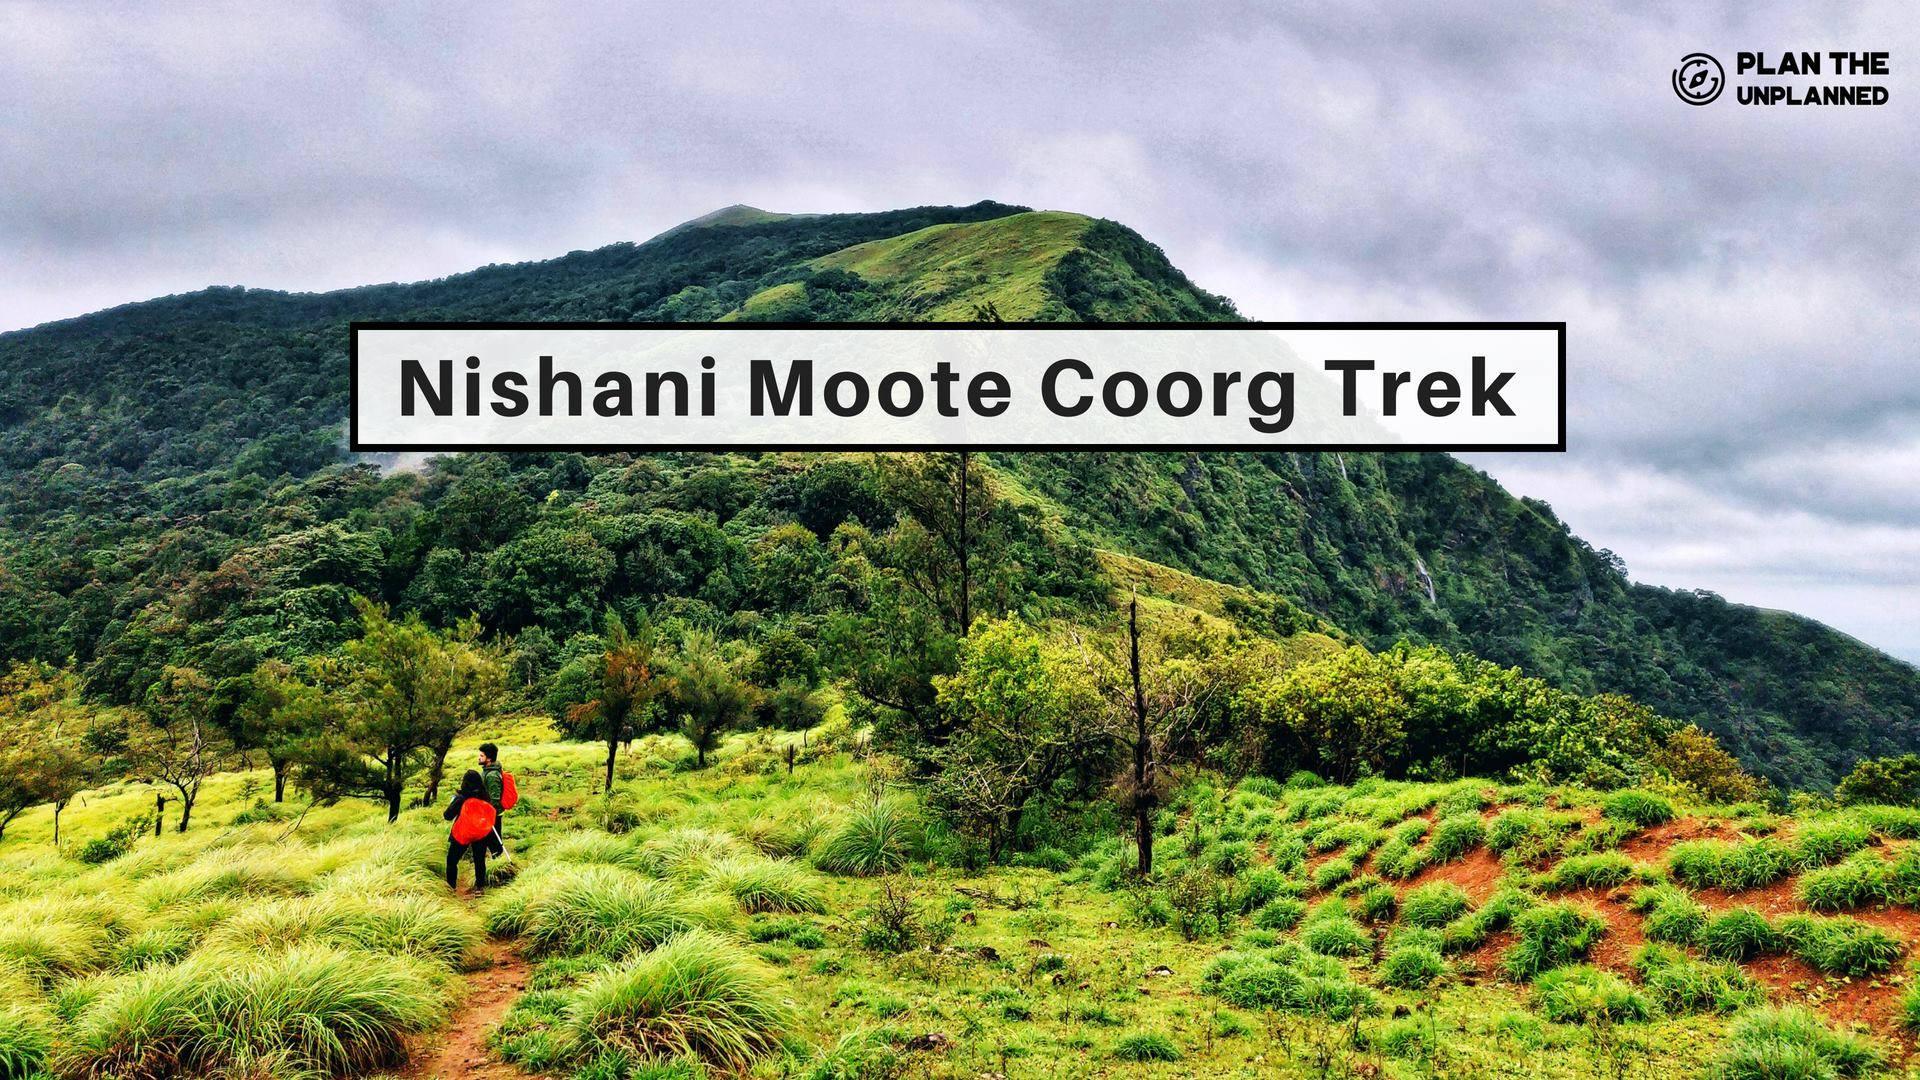 Nishani Motte Coorg Trek | Plan The Unplanned